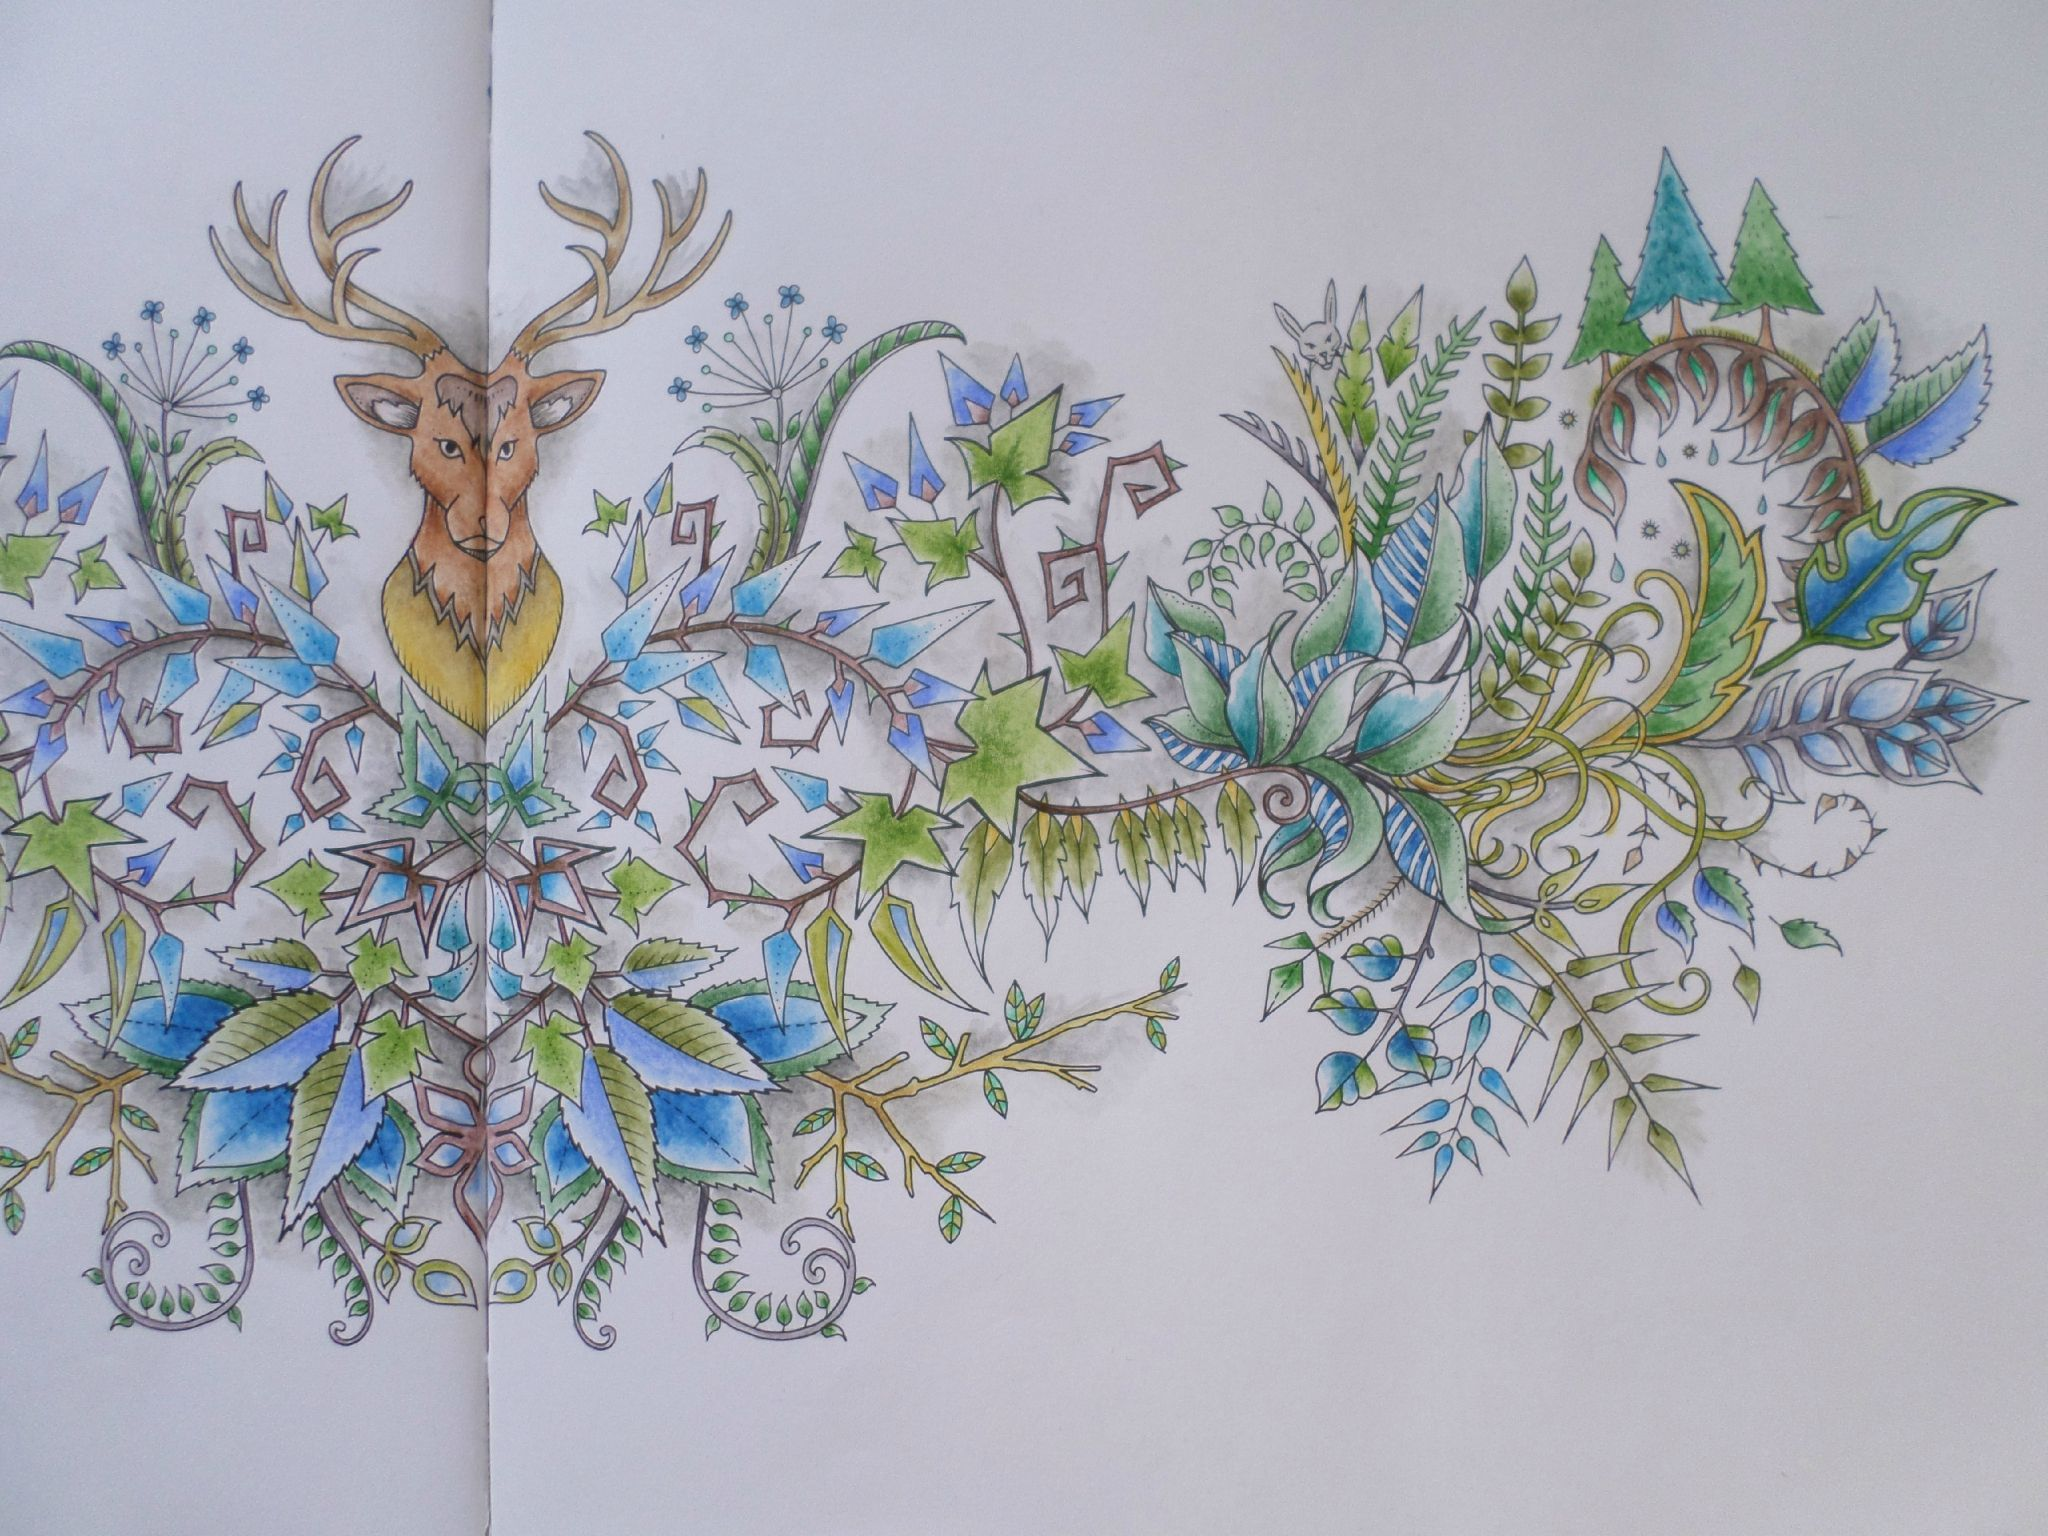 Coloriage livre Forªt Enchantée Johanna Basford par steffy Elsass crea